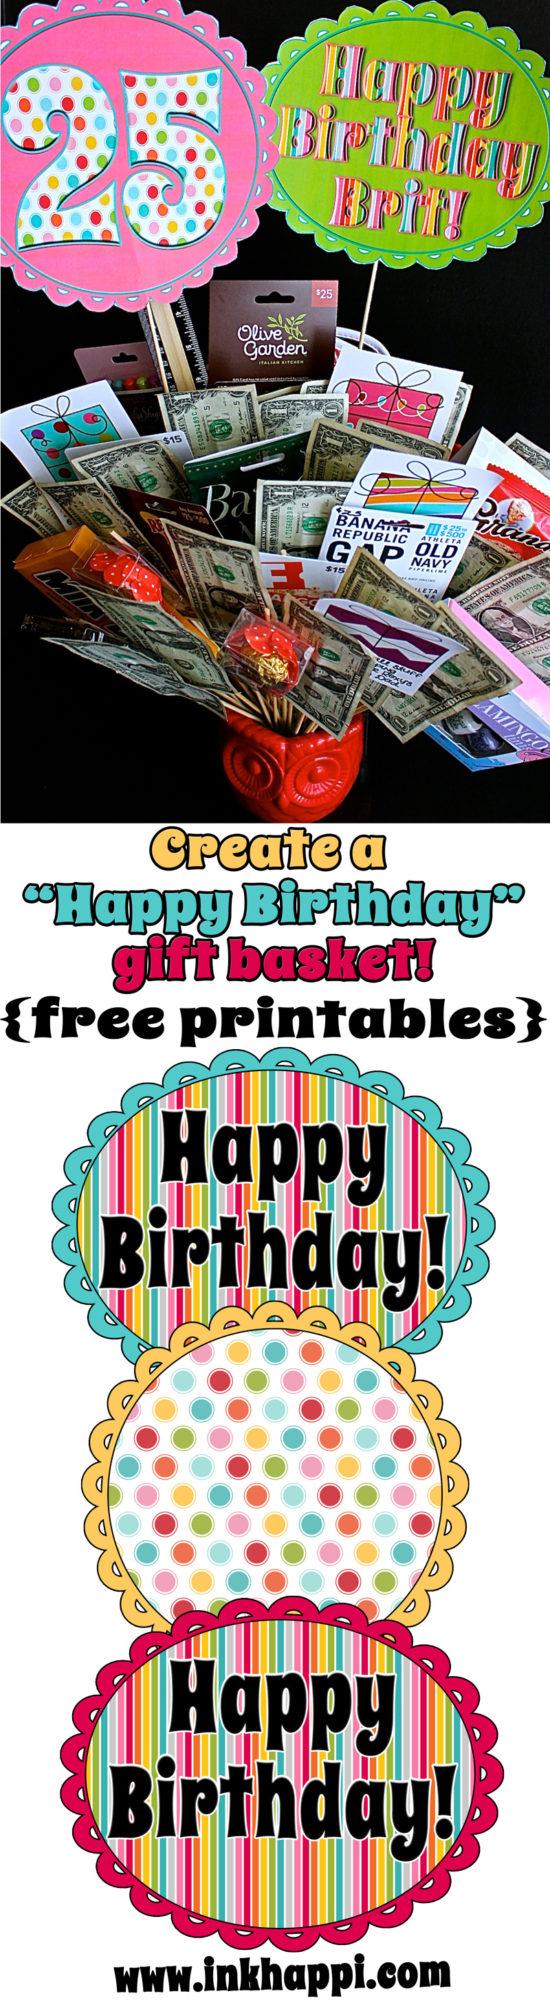 Birthday gift basket ideas with free printables!